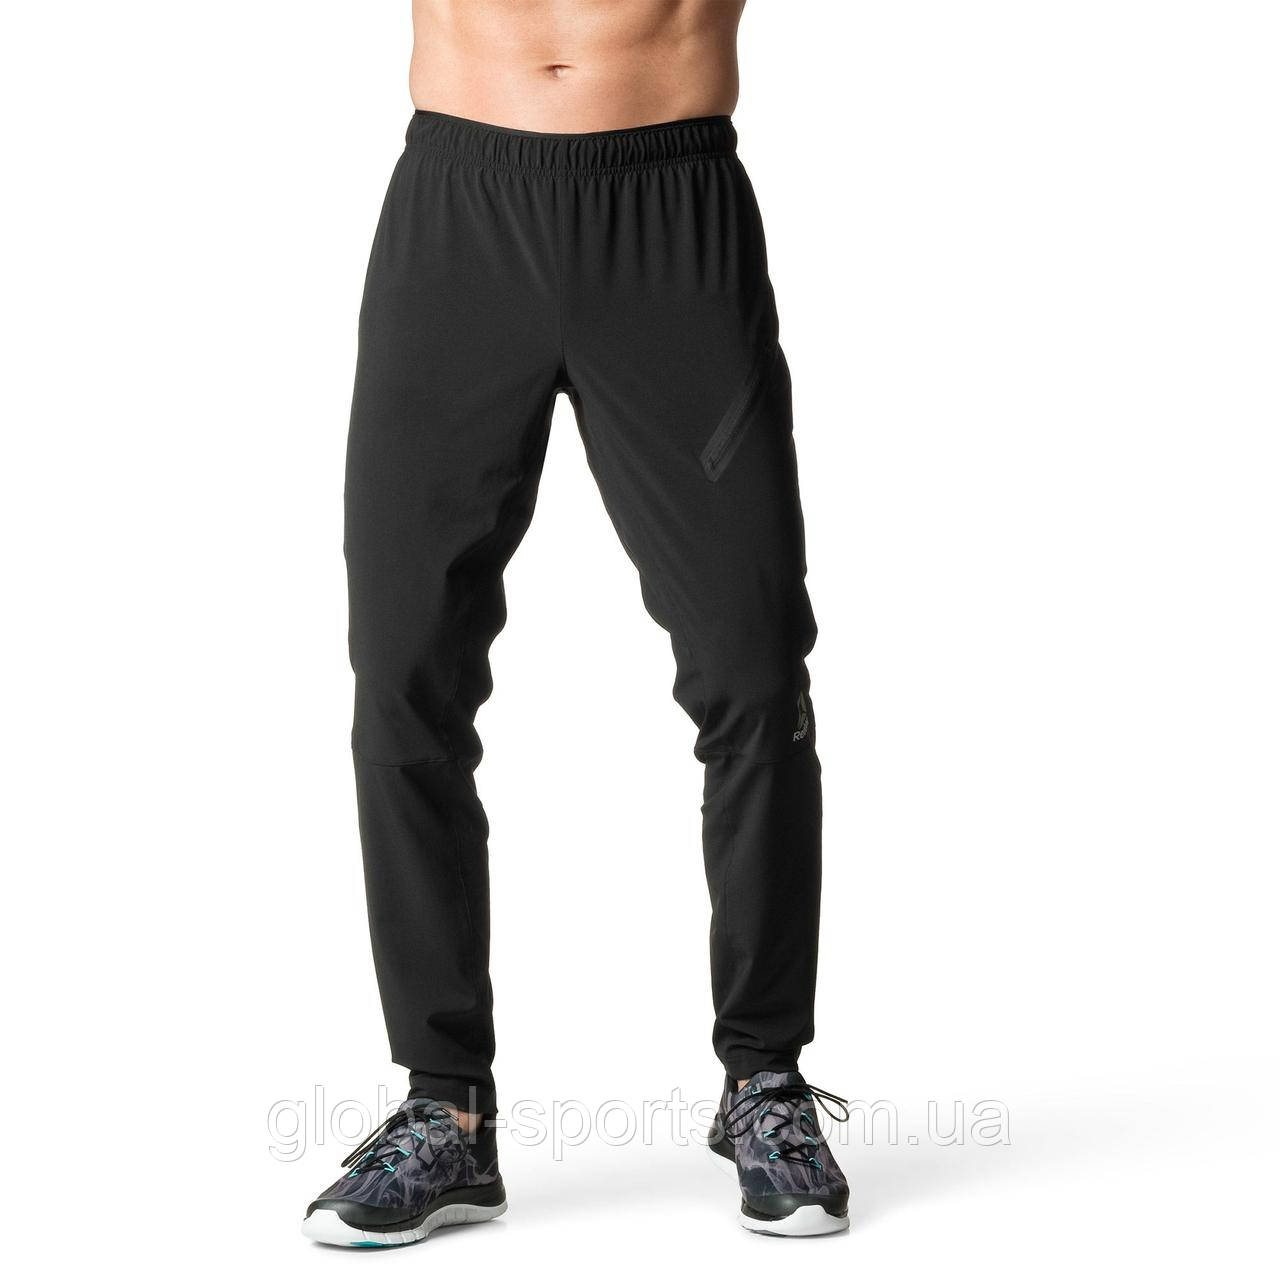 Мужские спортивные штаны Reebok Trackster Pants(Артикул:B45116)